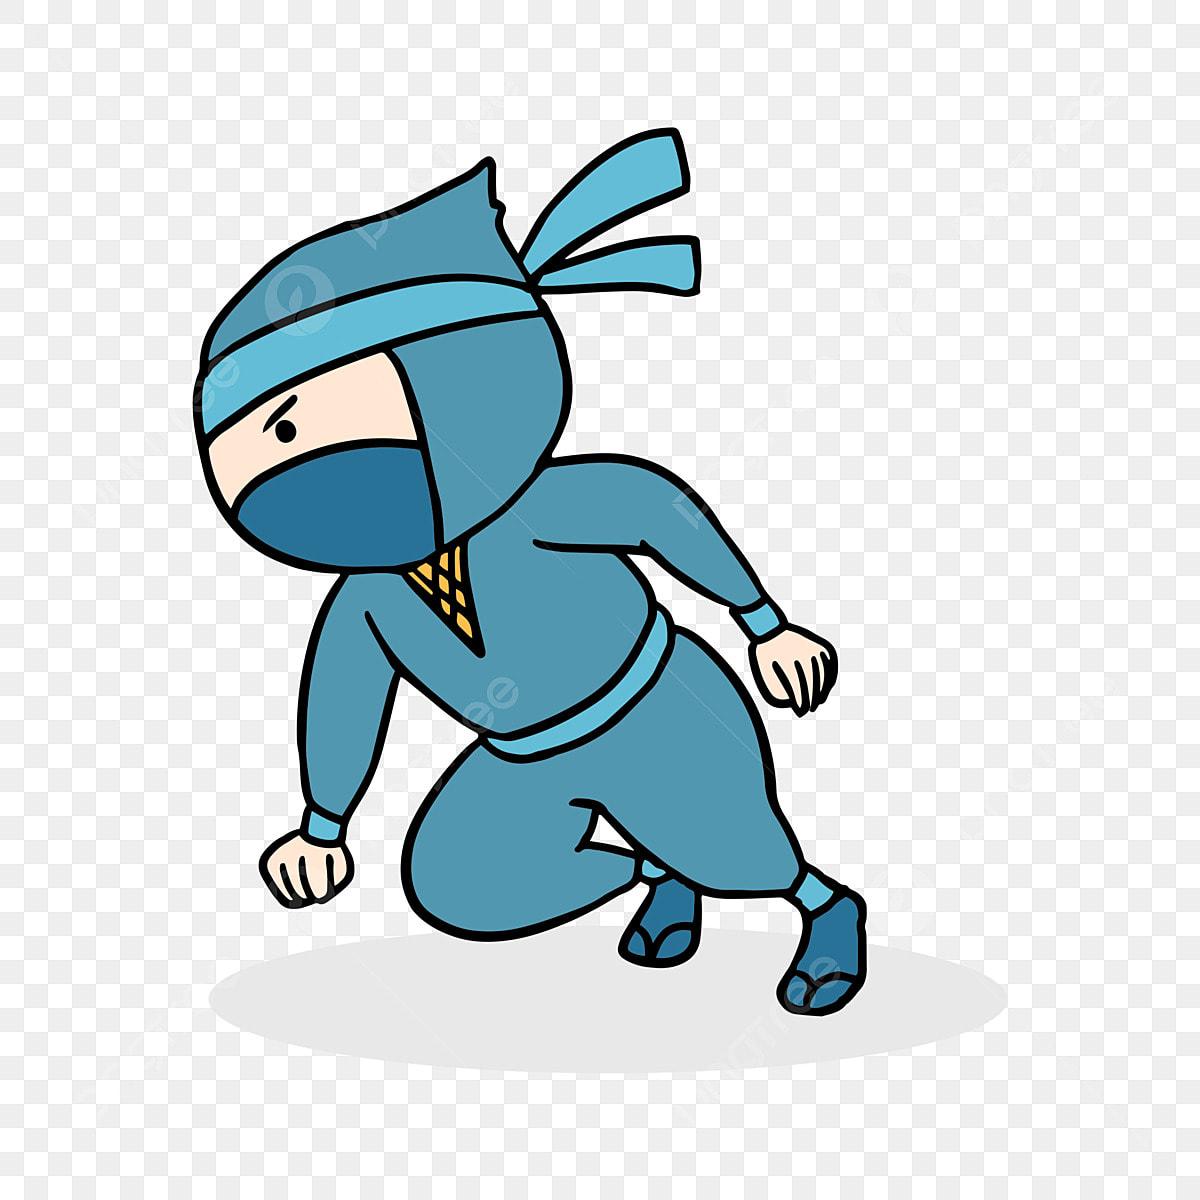 Padrao De Mao Extraidas Dos Desenhos Animados Ninja Japones Bonito